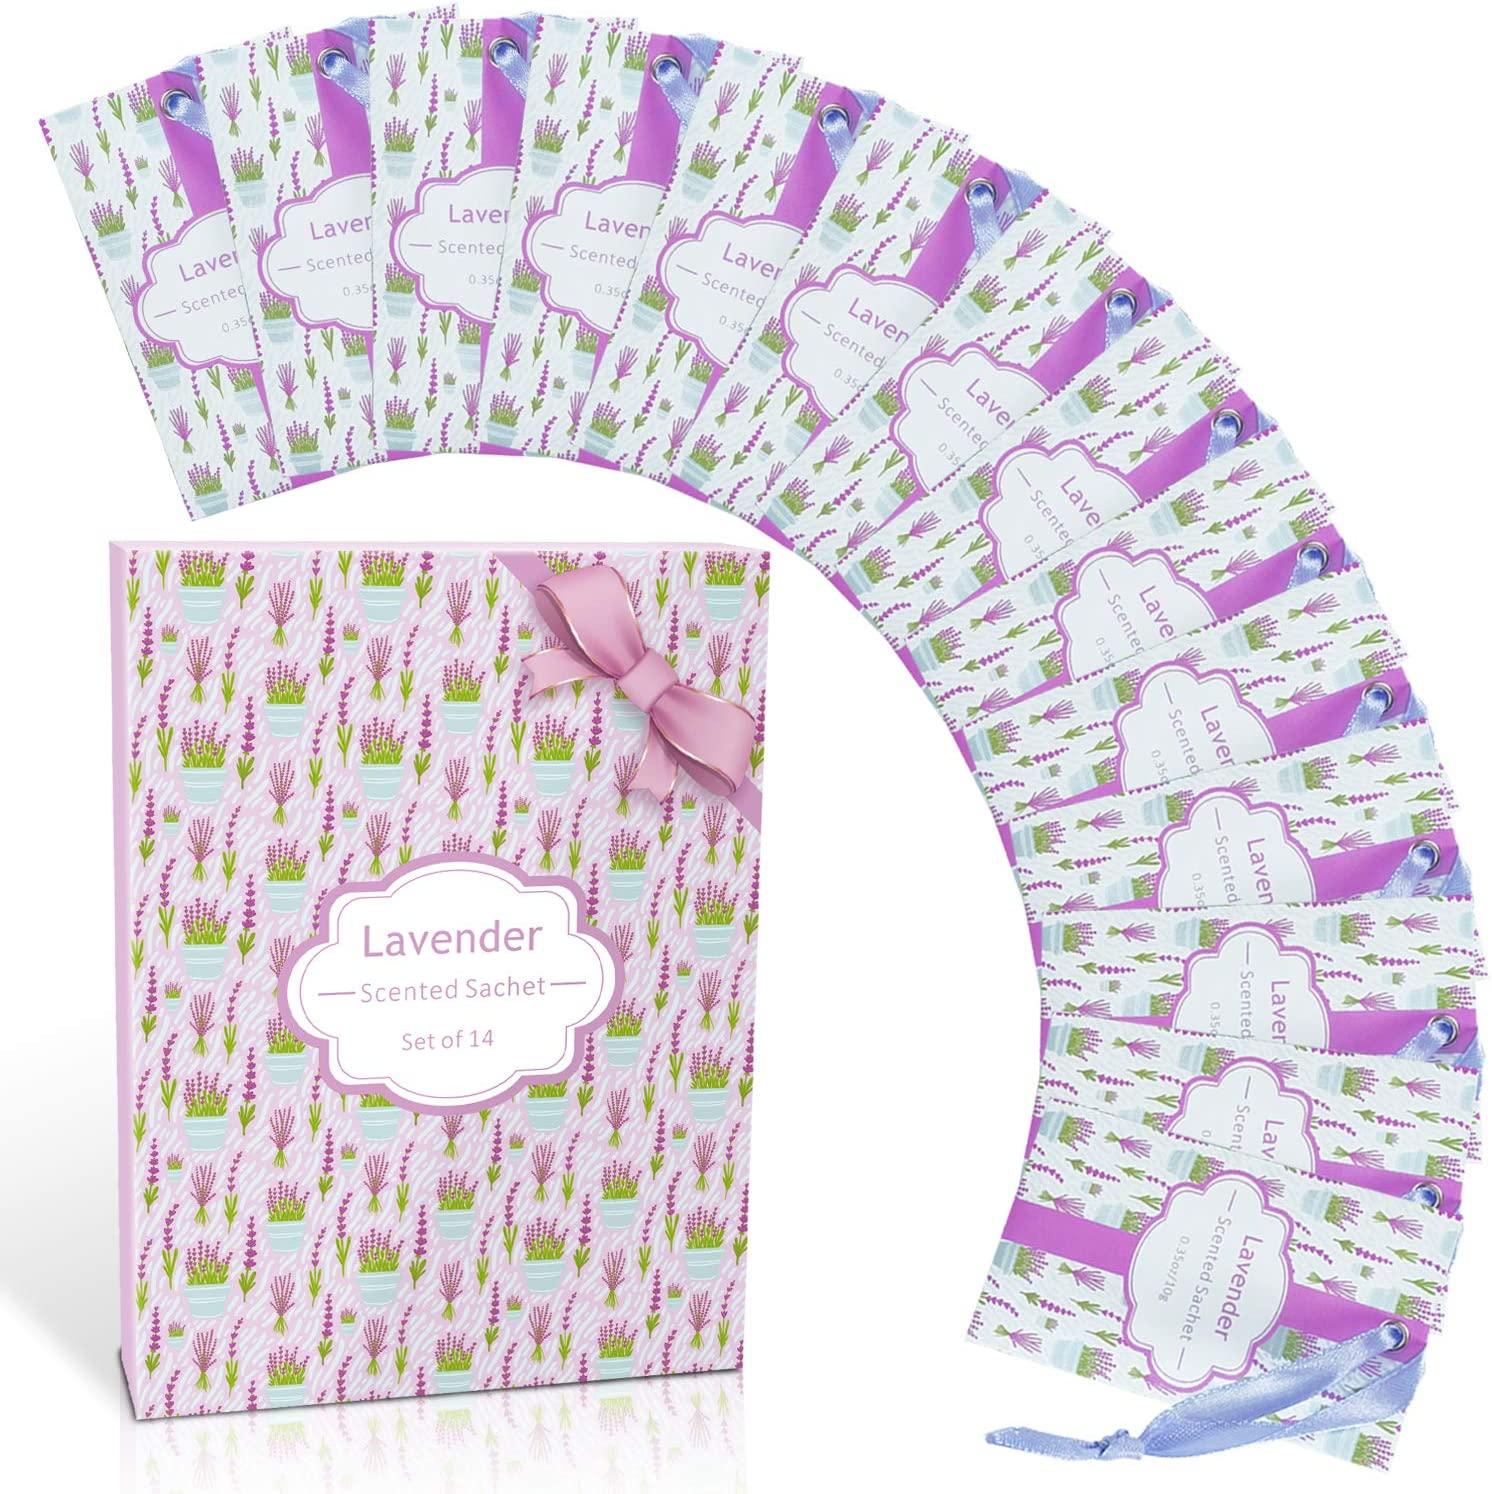 LA BELLEFÉE Scented Sachet,14-Packs Lavender Fragrance Packets Perfume Envelopes Sachets, Idea Gift for Home, Wardrobe, Drawer, Car, Closets